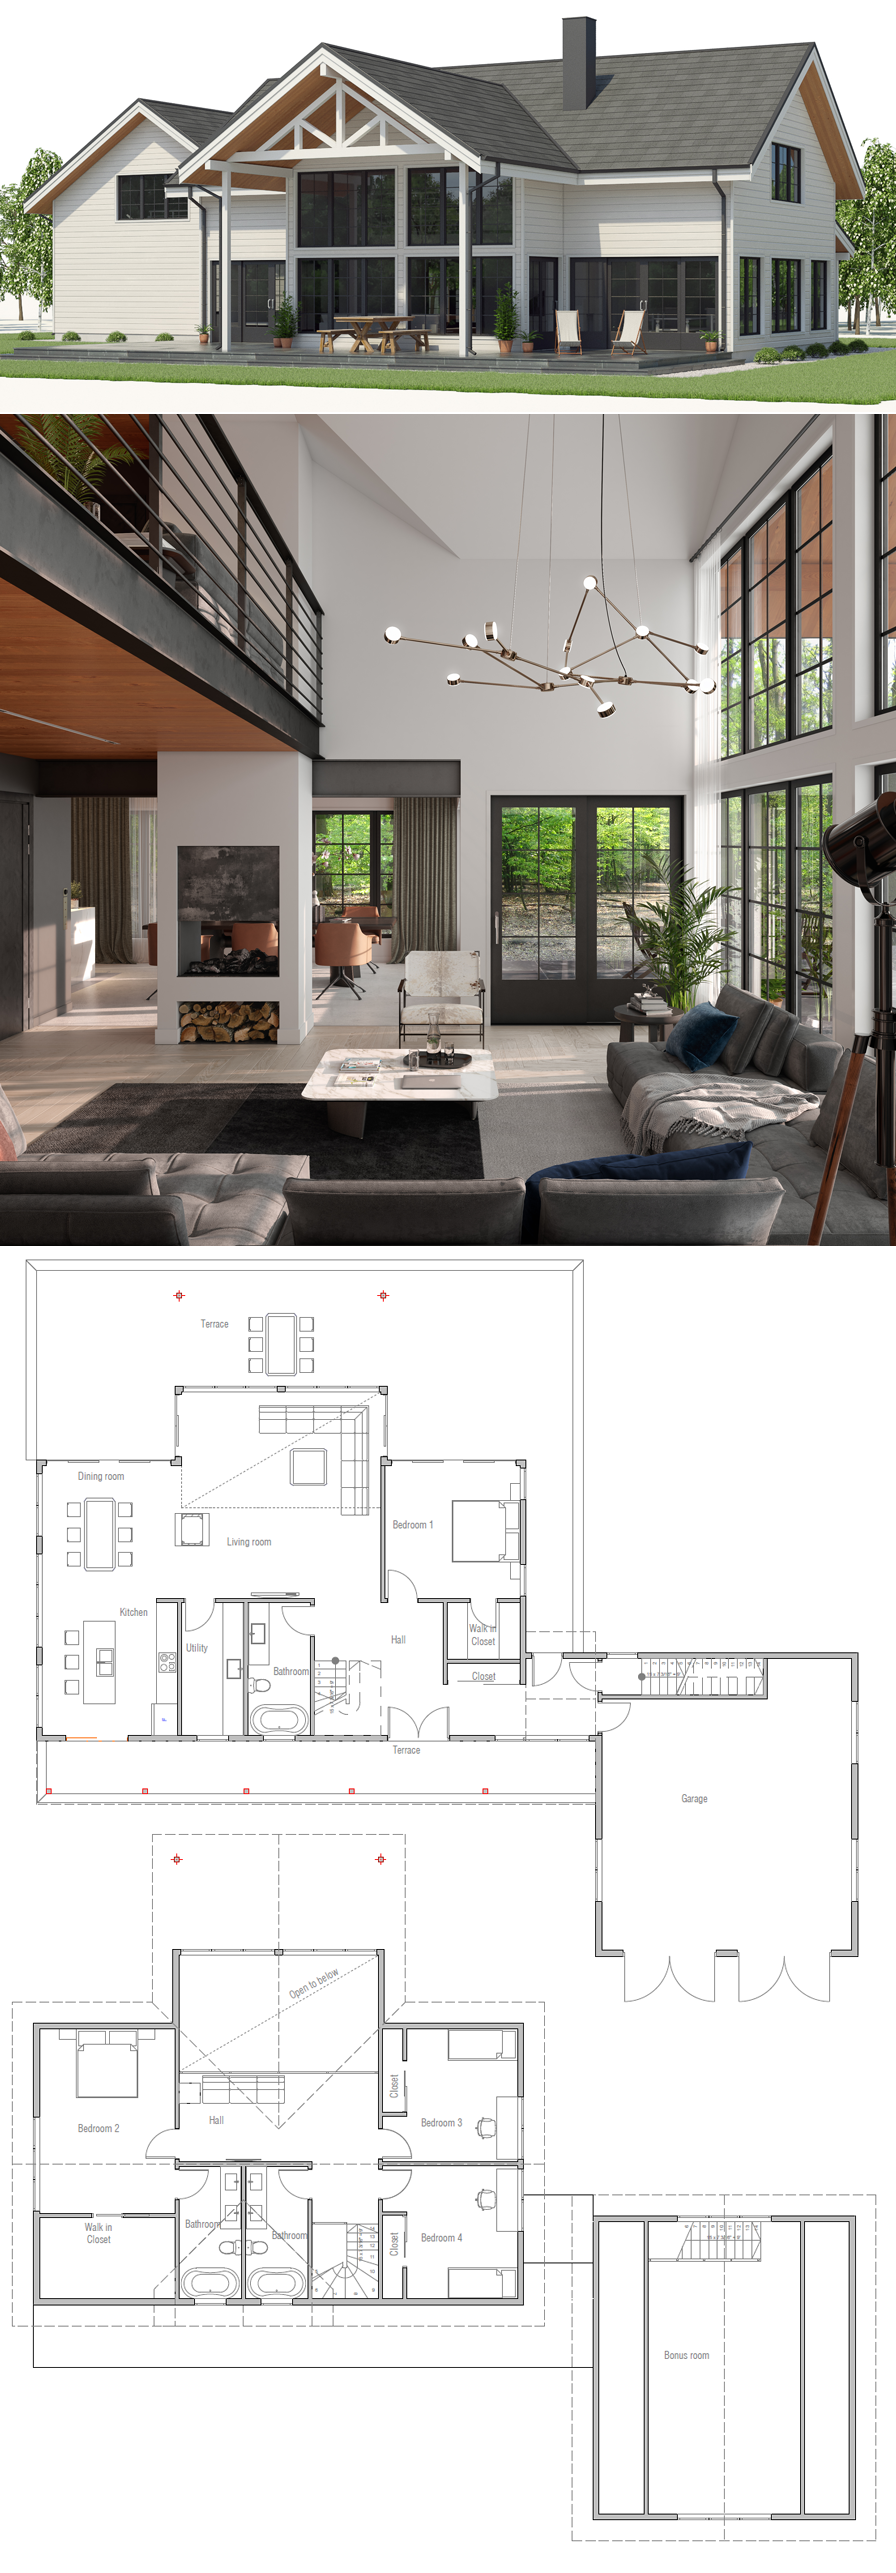 Small house plans also billy ekilejo kenya in futura casa rh ar pinterest